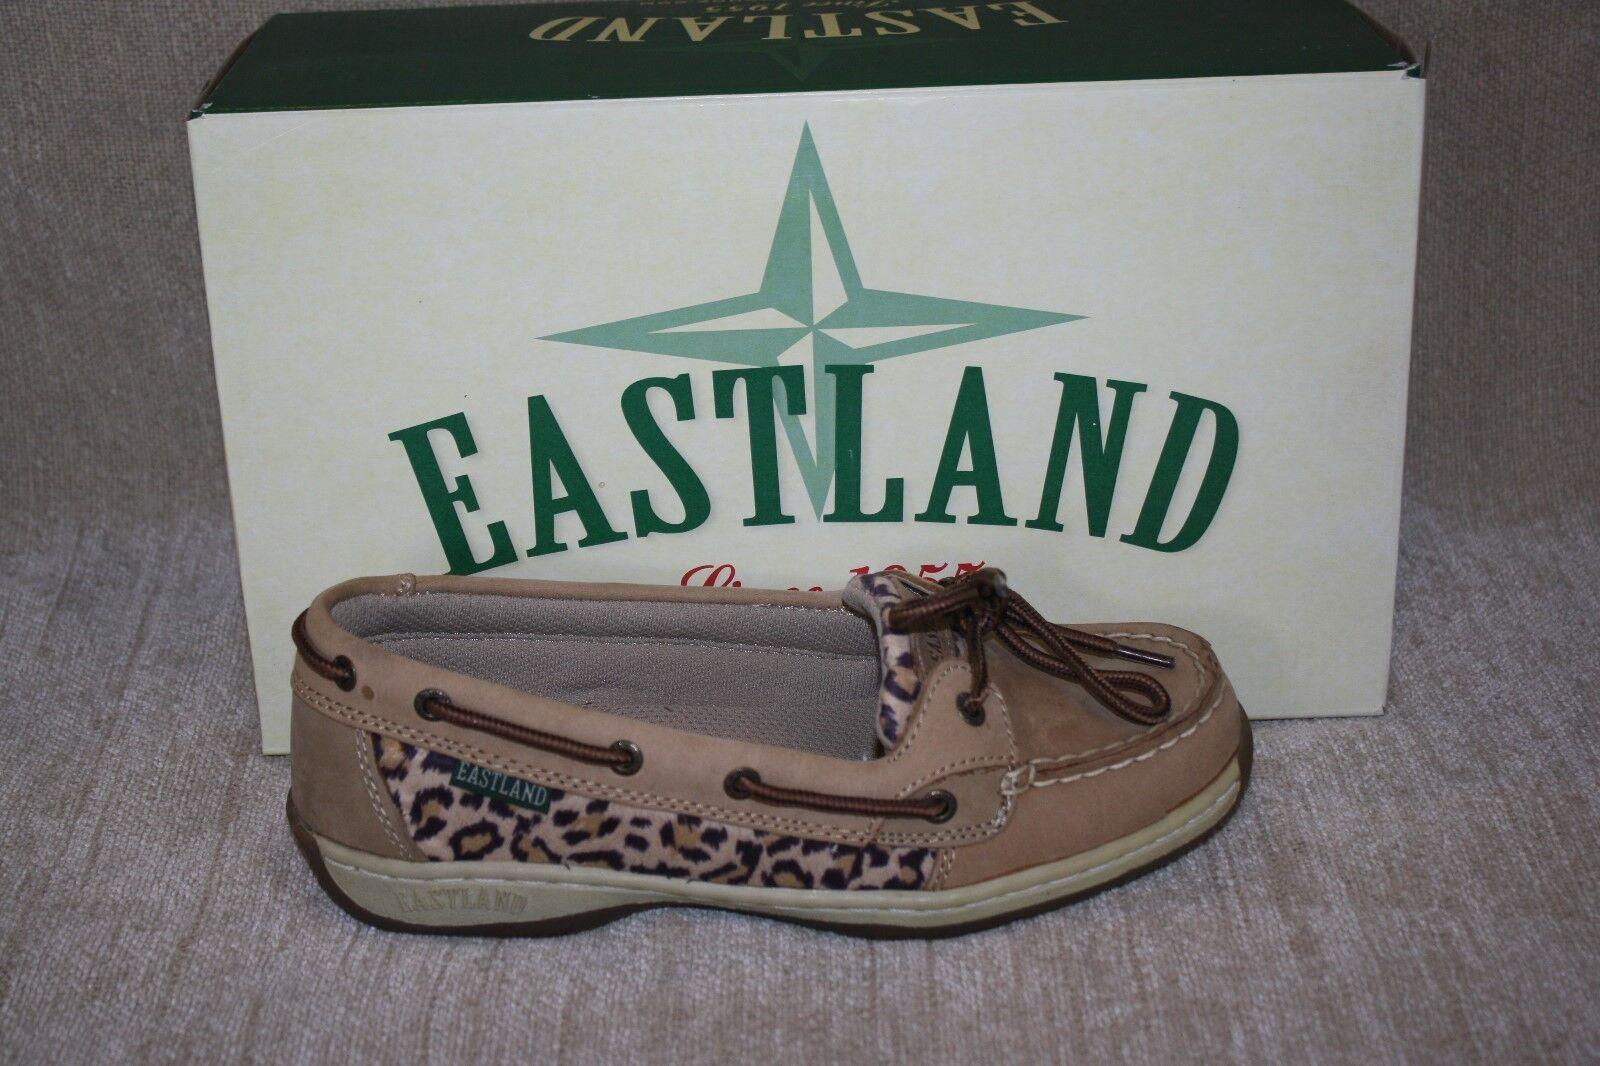 Damenschuhe EASTLAND LEOPARD PRINT TAN SUNRISE BOAT Schuhe-SEE SIZES (B141)